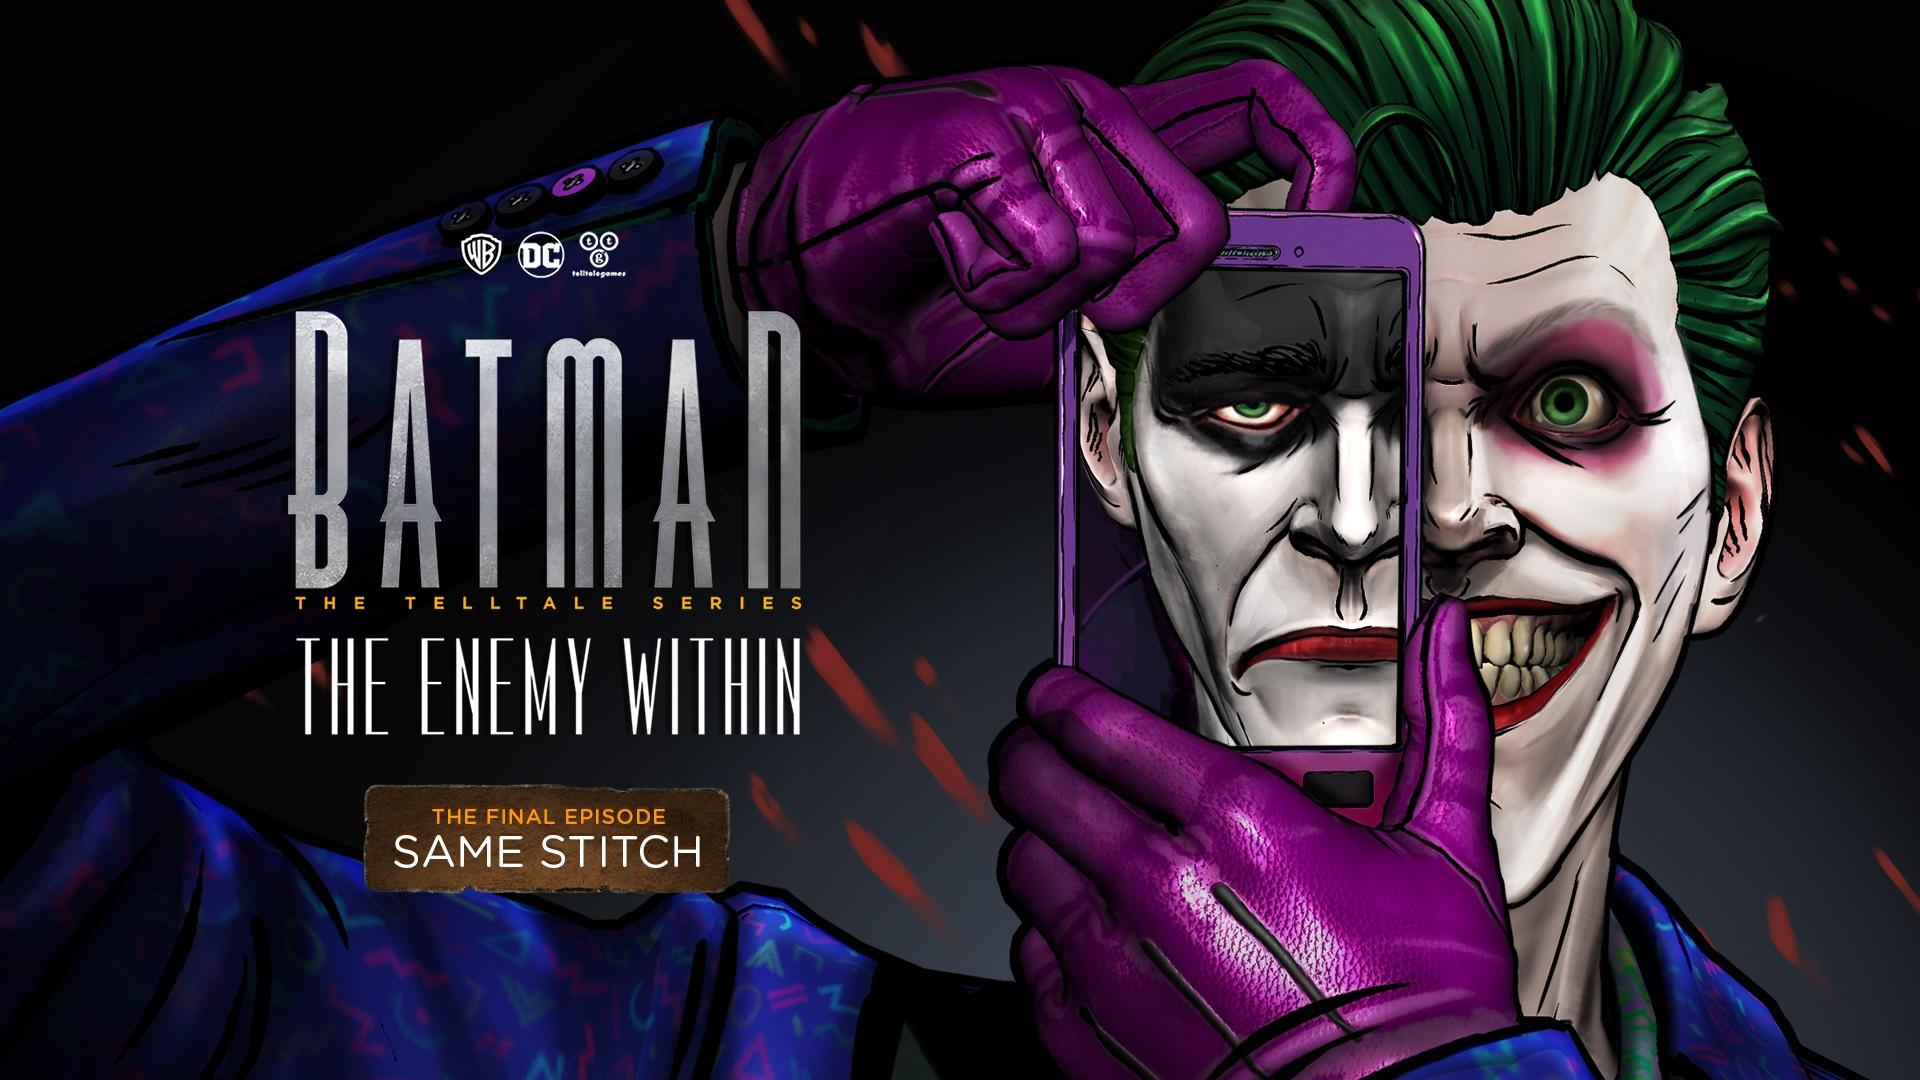 Pubg Hero By Gilbertgraphics: How Telltale Reinvented The Joker